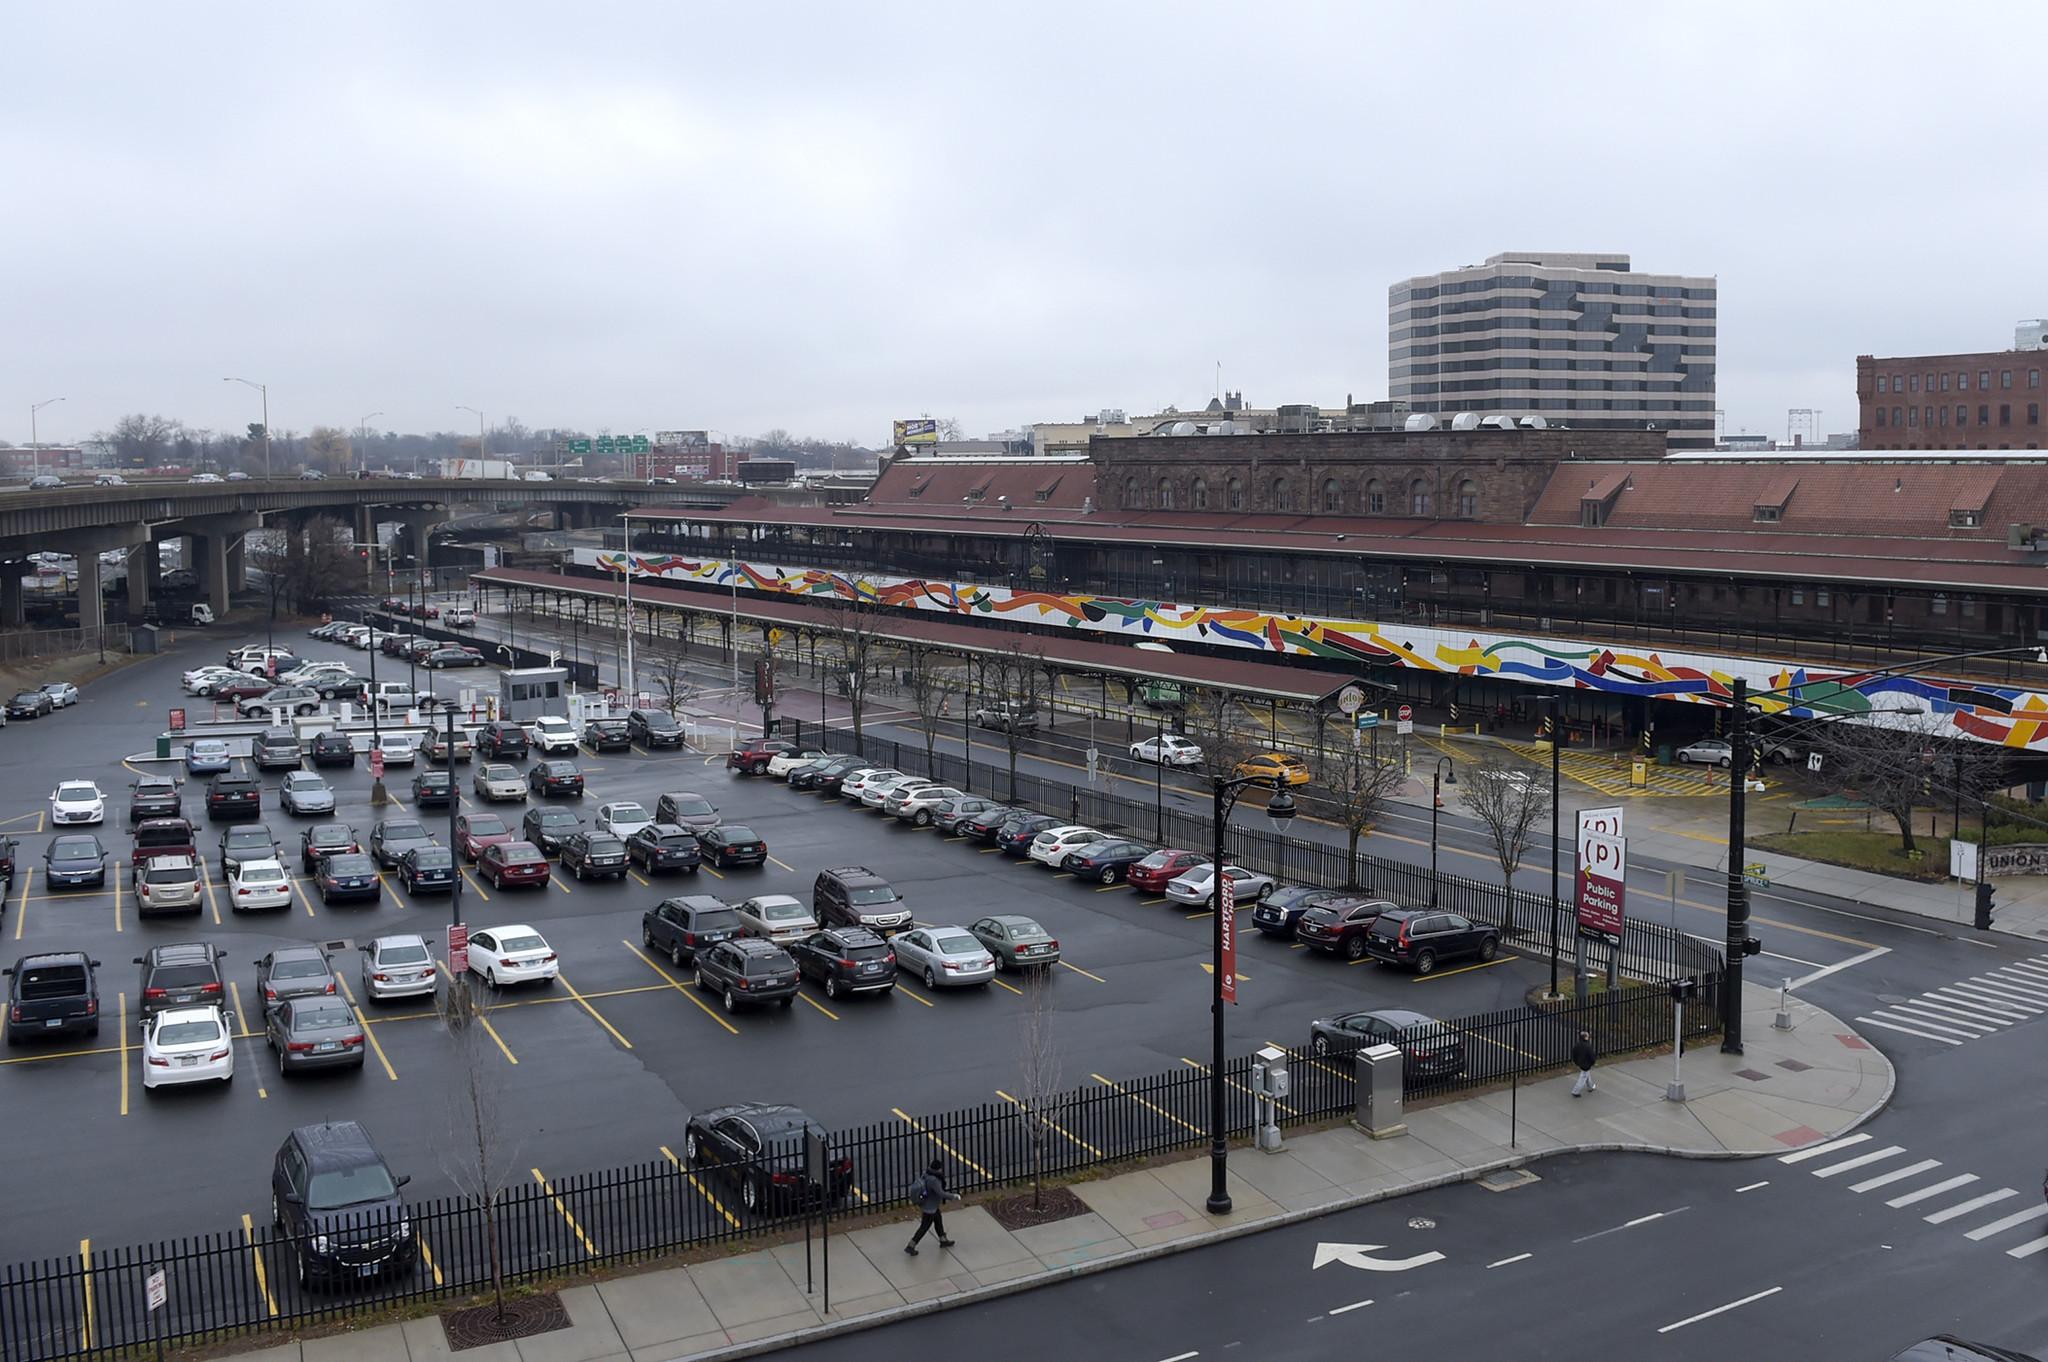 Union Station Parking Garage Plan Put On Hold - Hartford Courant